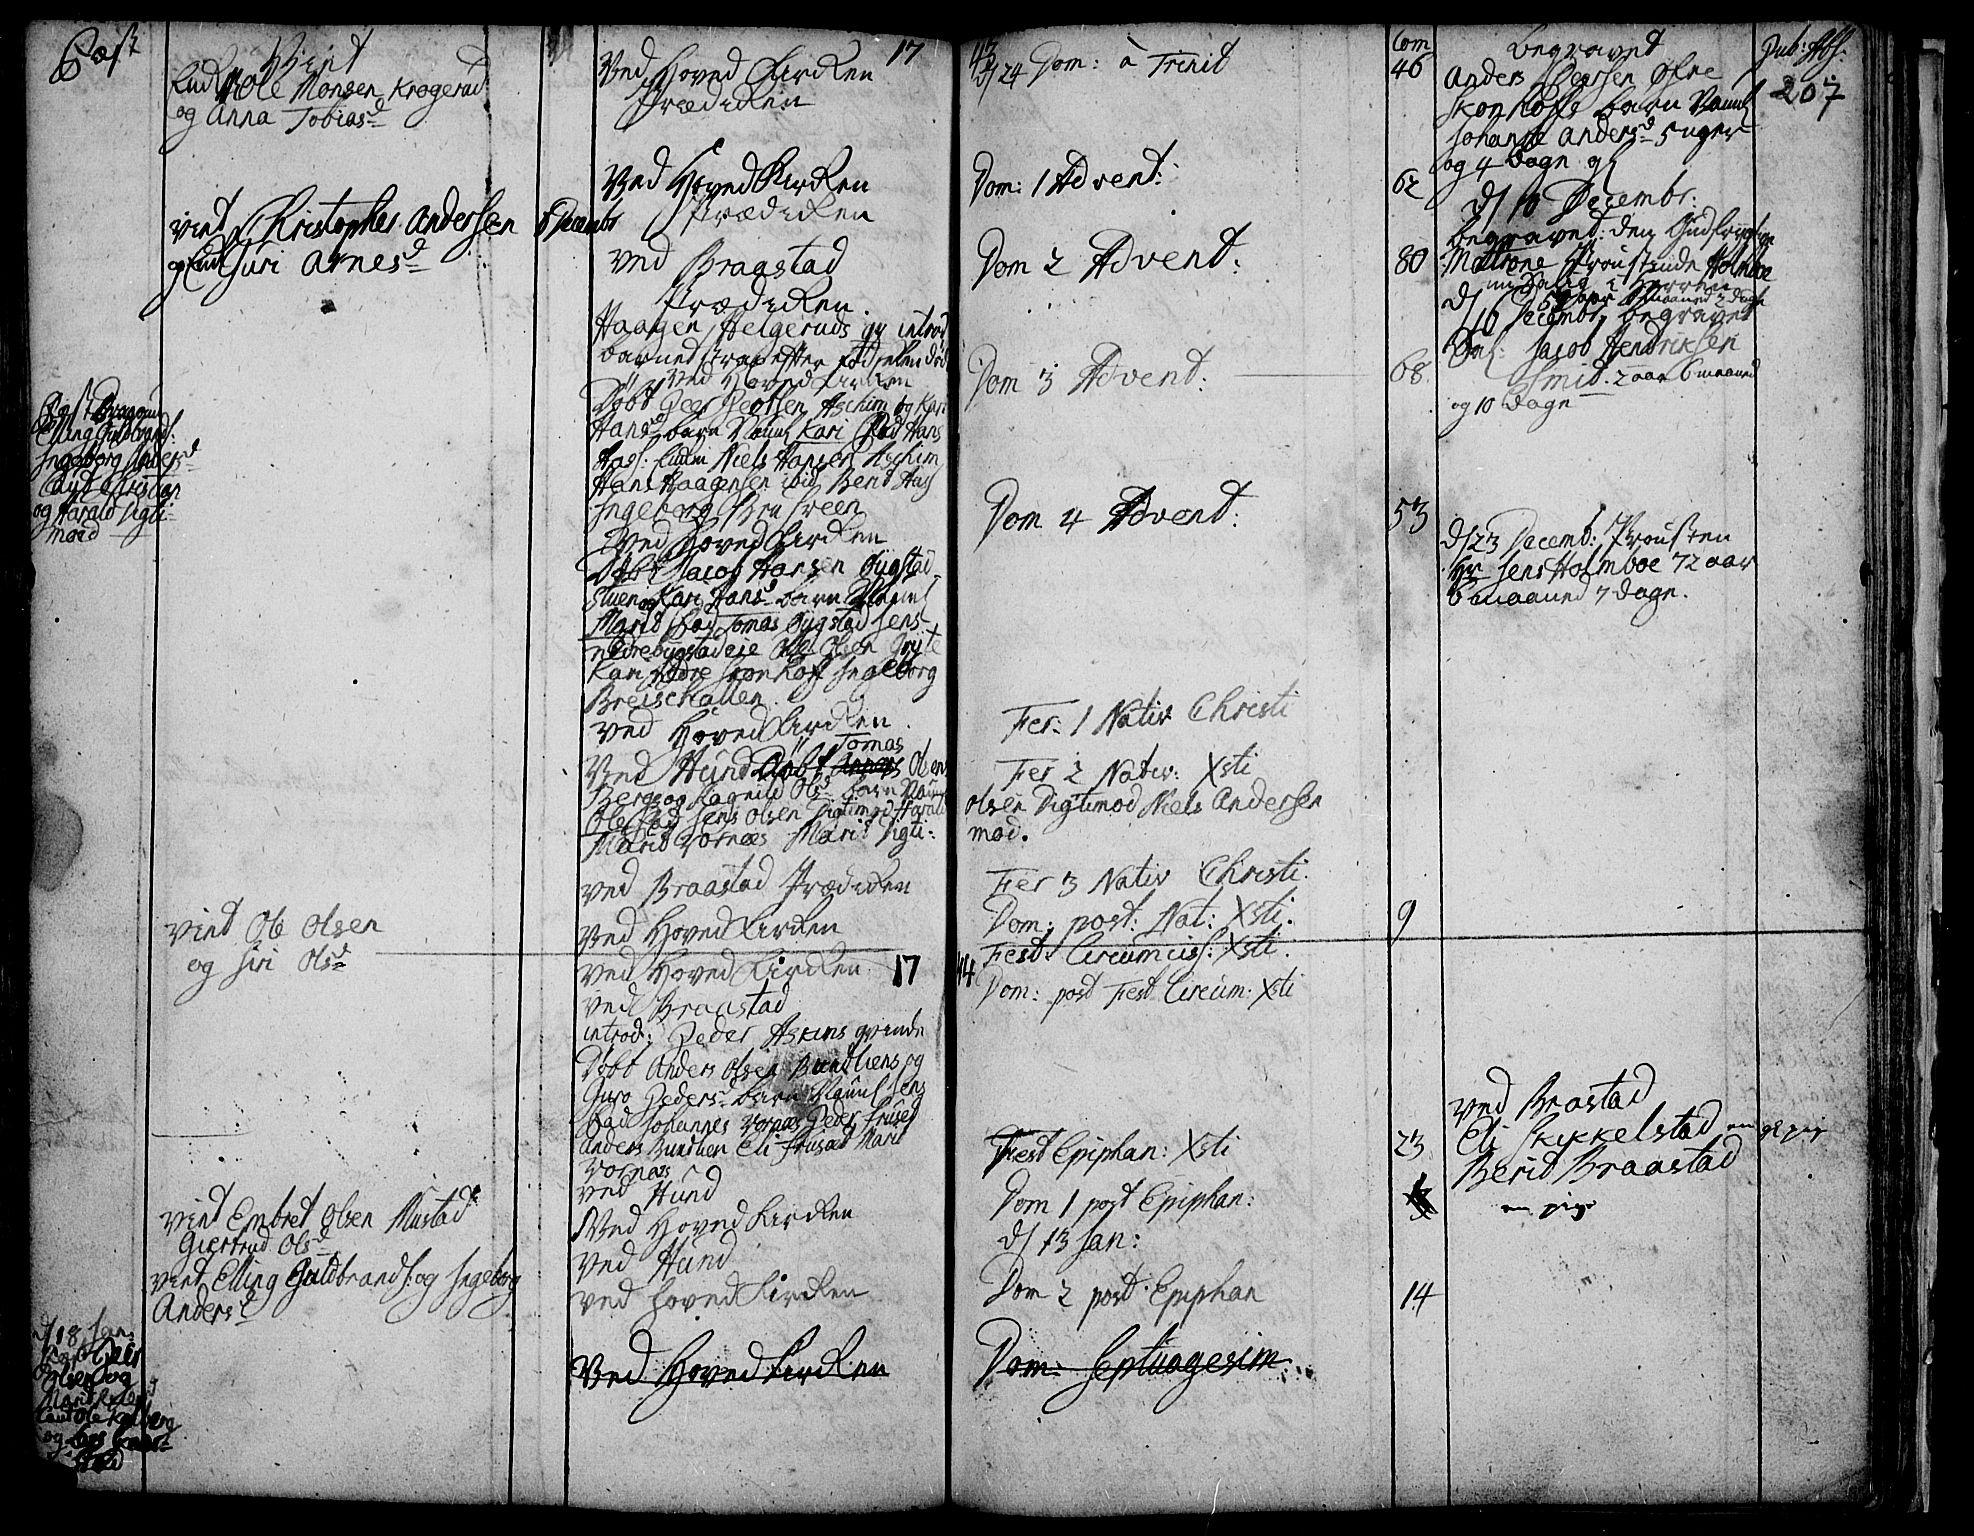 SAH, Vardal prestekontor, H/Ha/Haa/L0001: Ministerialbok nr. 1, 1706-1748, s. 207